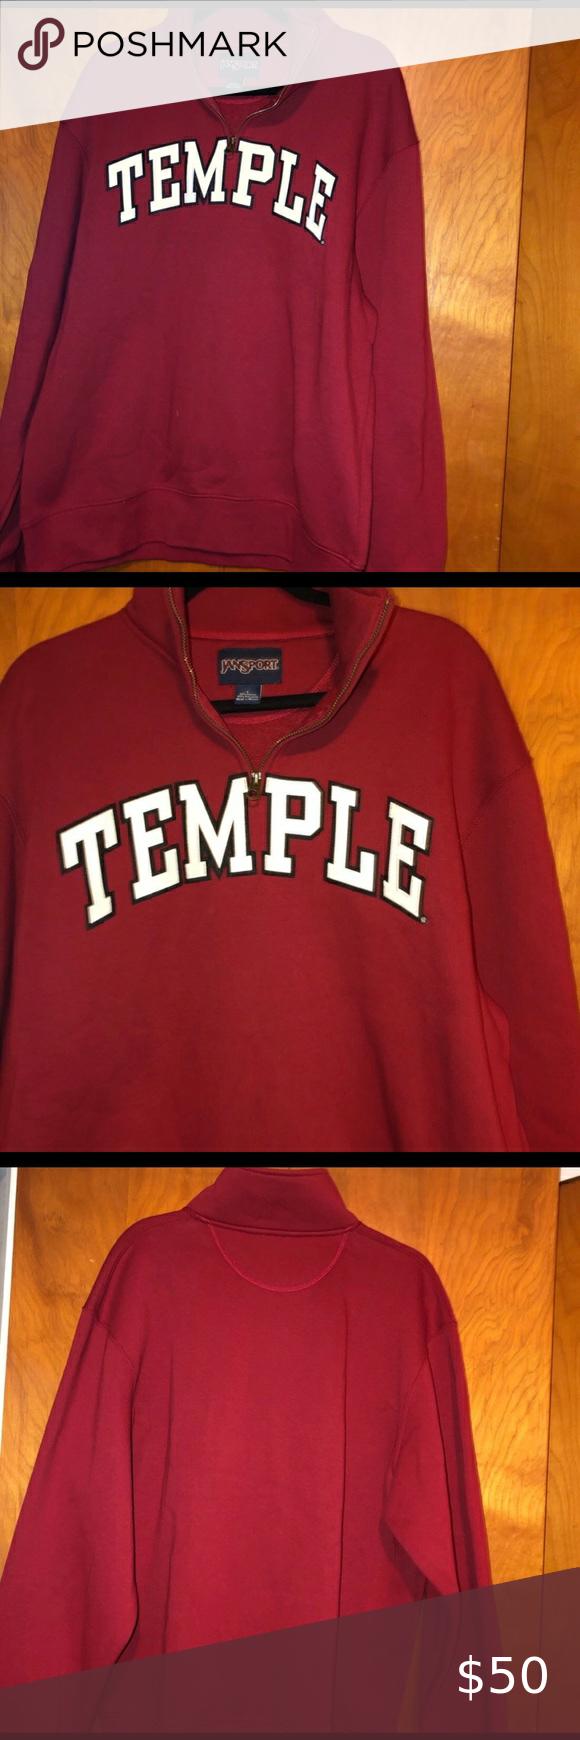 Jansport Temple University Owls Sweatshirt L Sweatshirts Owl Sweatshirt Sweatshirt Shirt [ 1740 x 580 Pixel ]